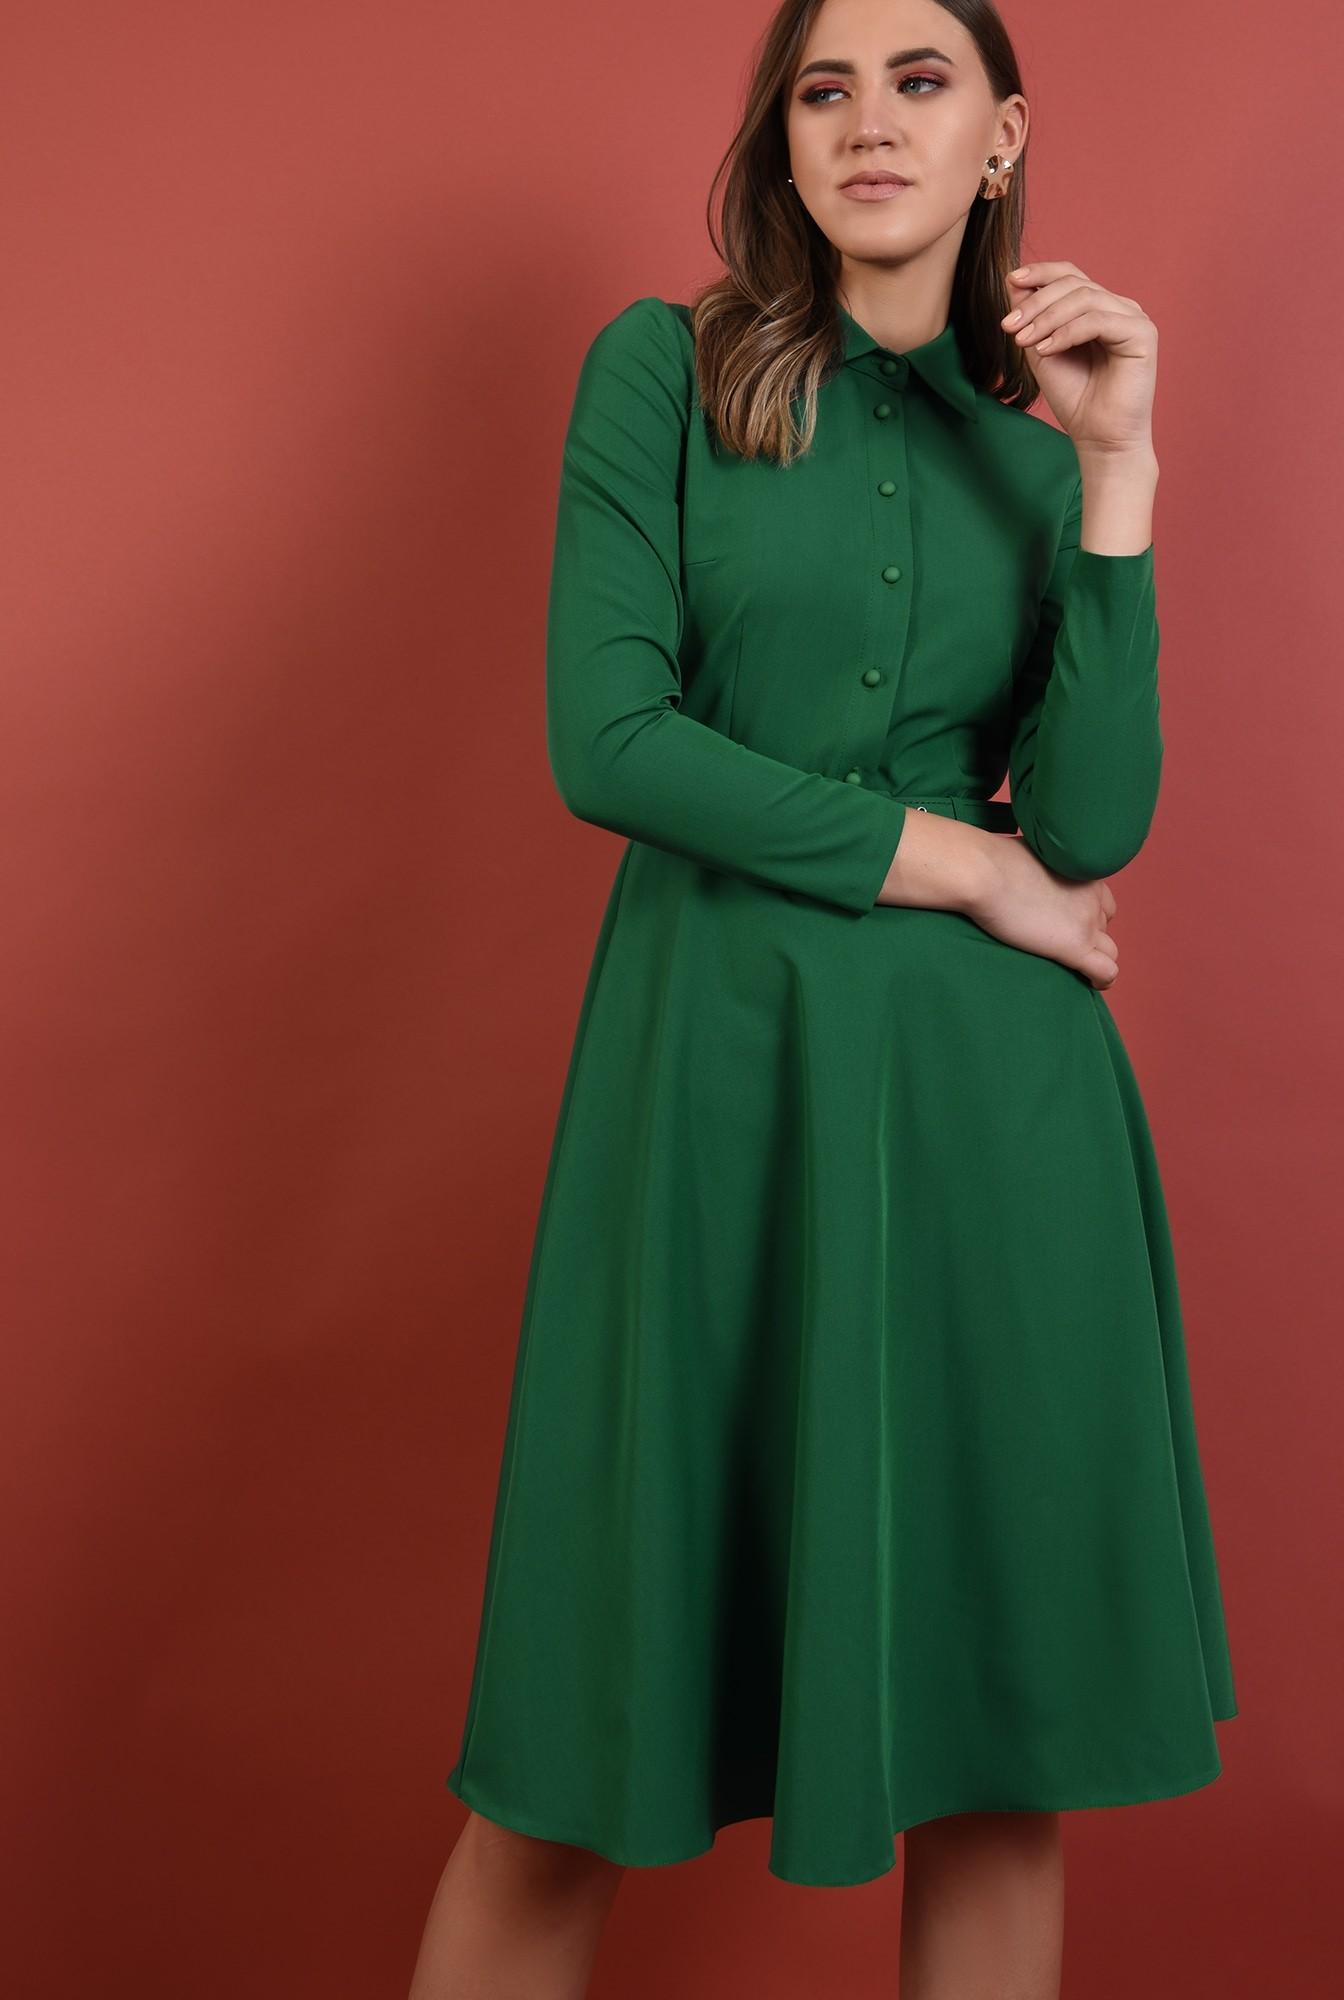 0 - 360 - rochie verde, office, midi, croi evazat, maneci lungi, curea, Poema